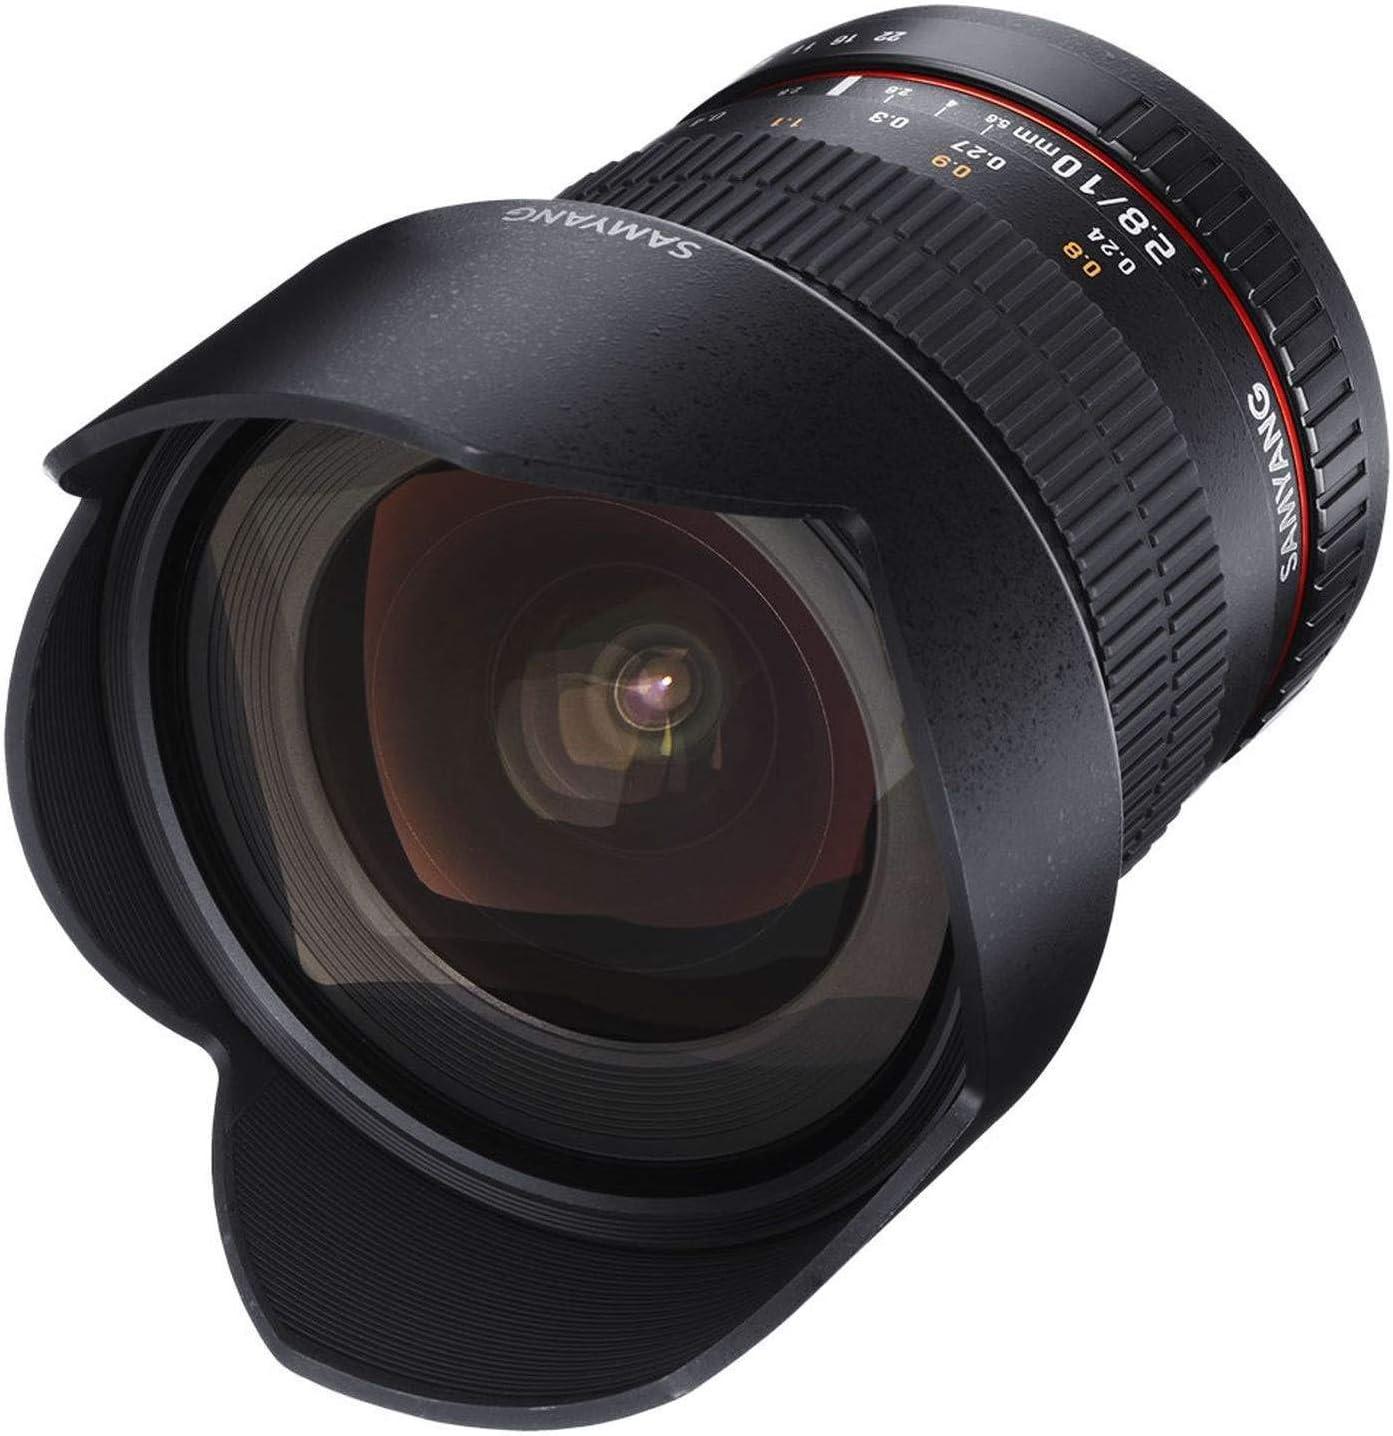 Samyang 10mm F2 8 Objektiv Für Anschluss Fuji X Kamera